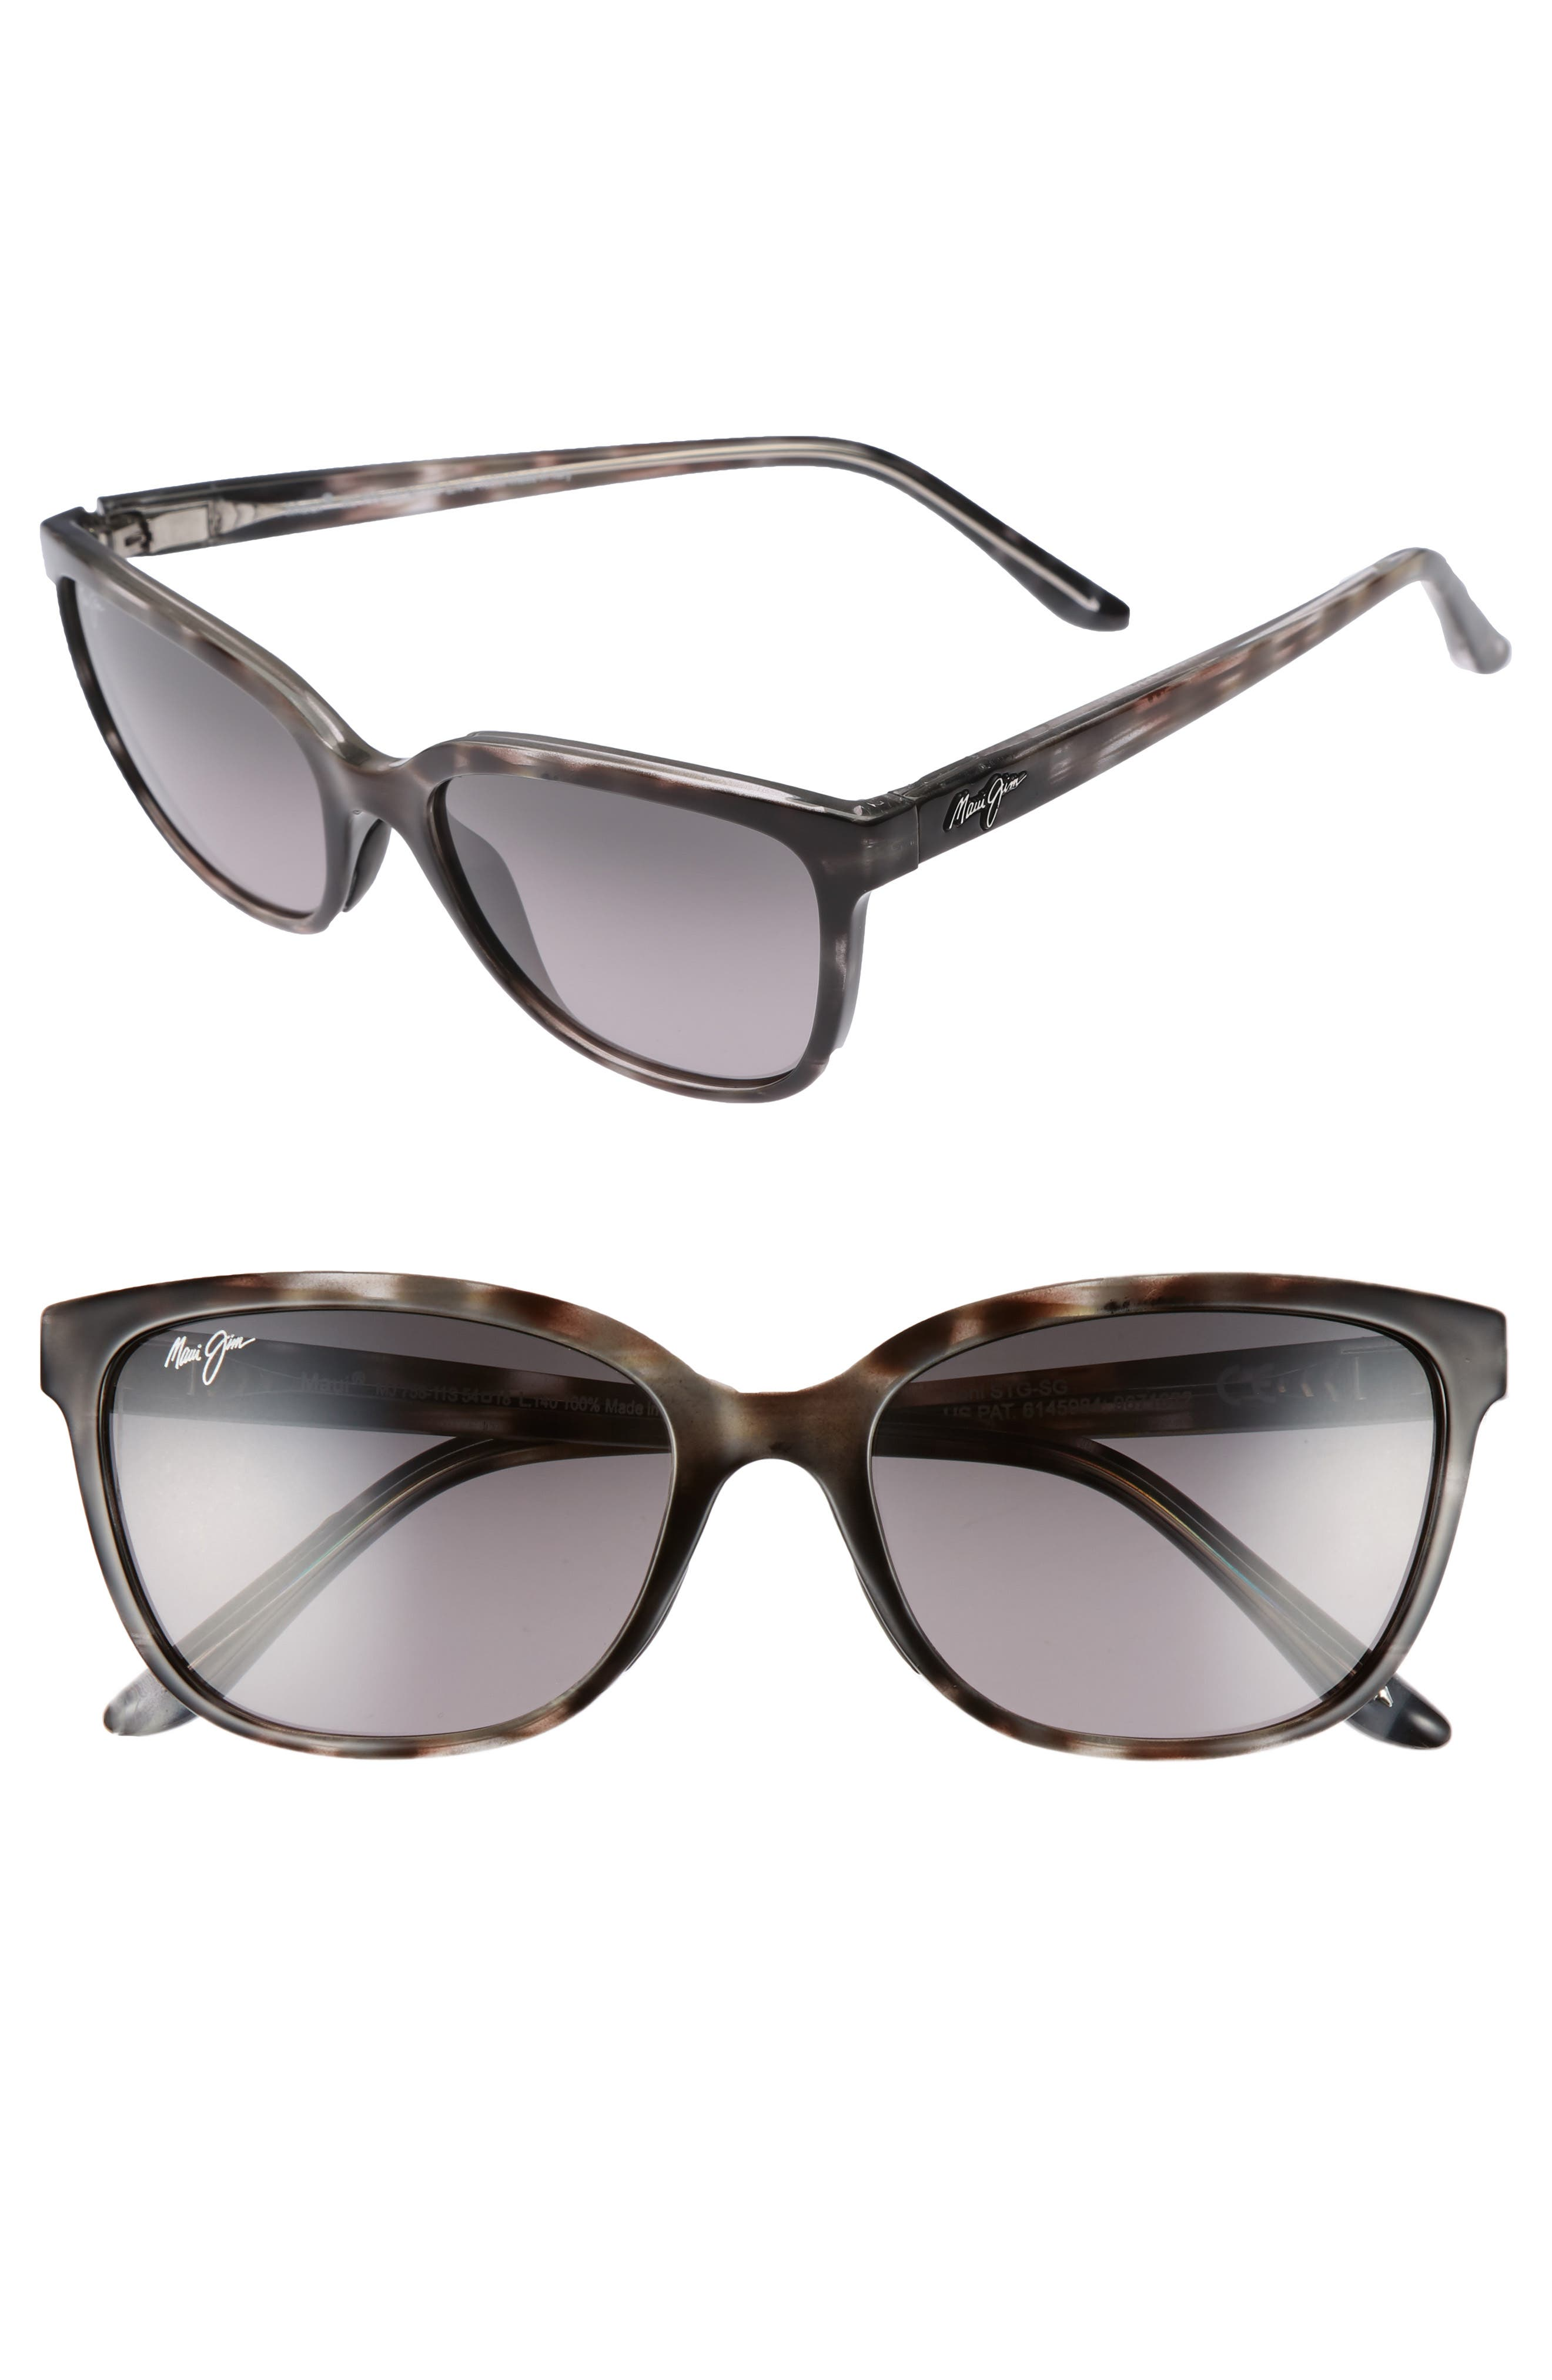 Maui Jim Honi 5m Polarized Cat Eye Sunglasses - Grey Tortoise Stripe